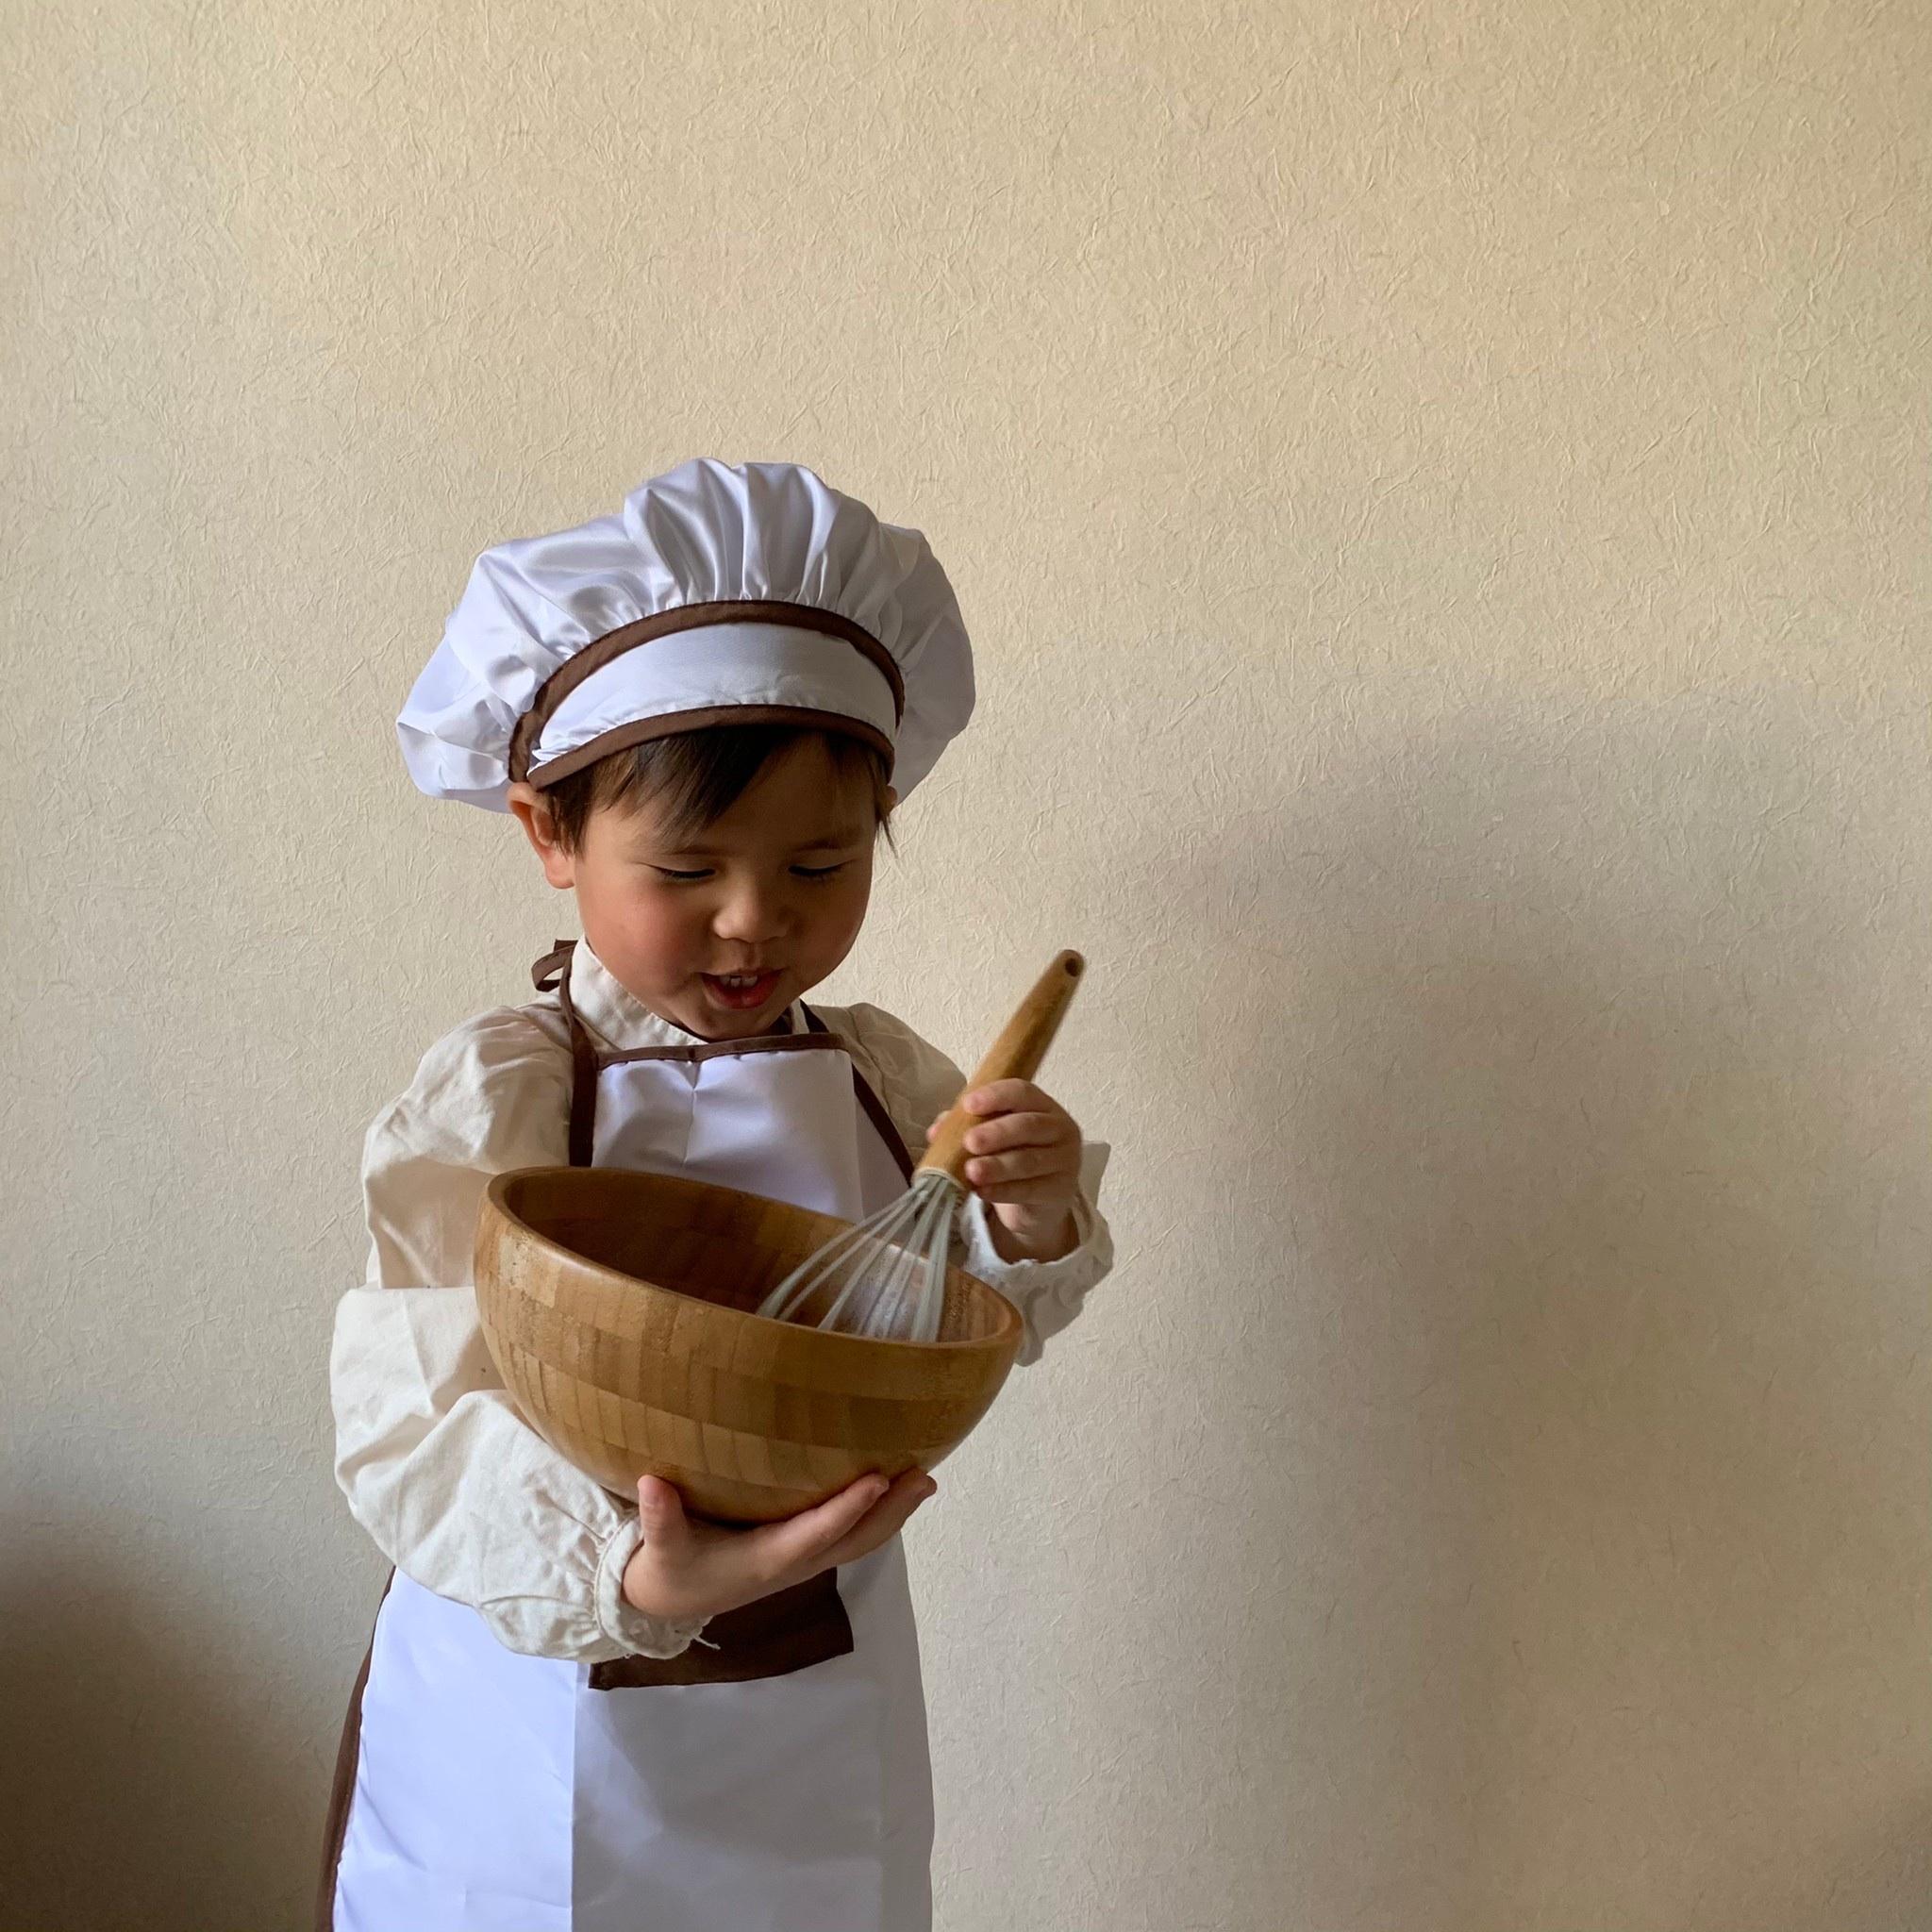 【mimosa original】 little chef set